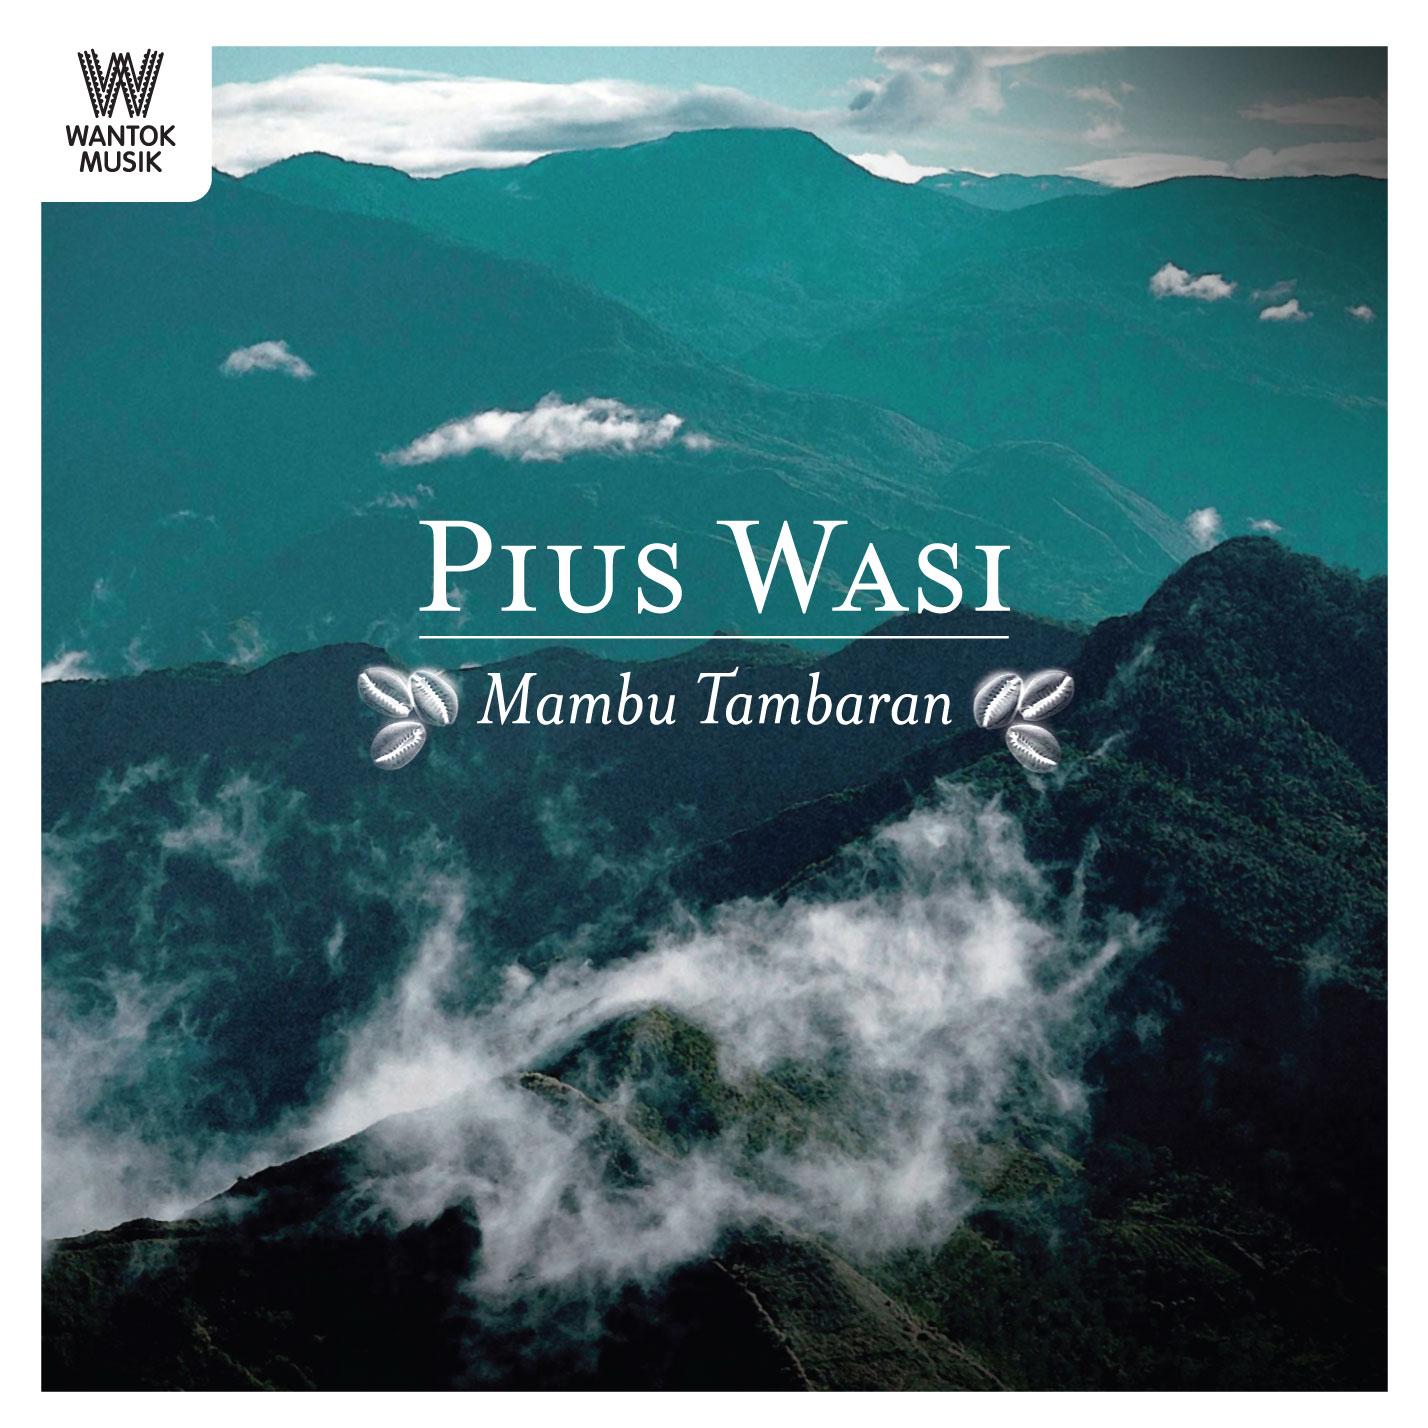 Pius Wasi - Mambu Tambaran - Album